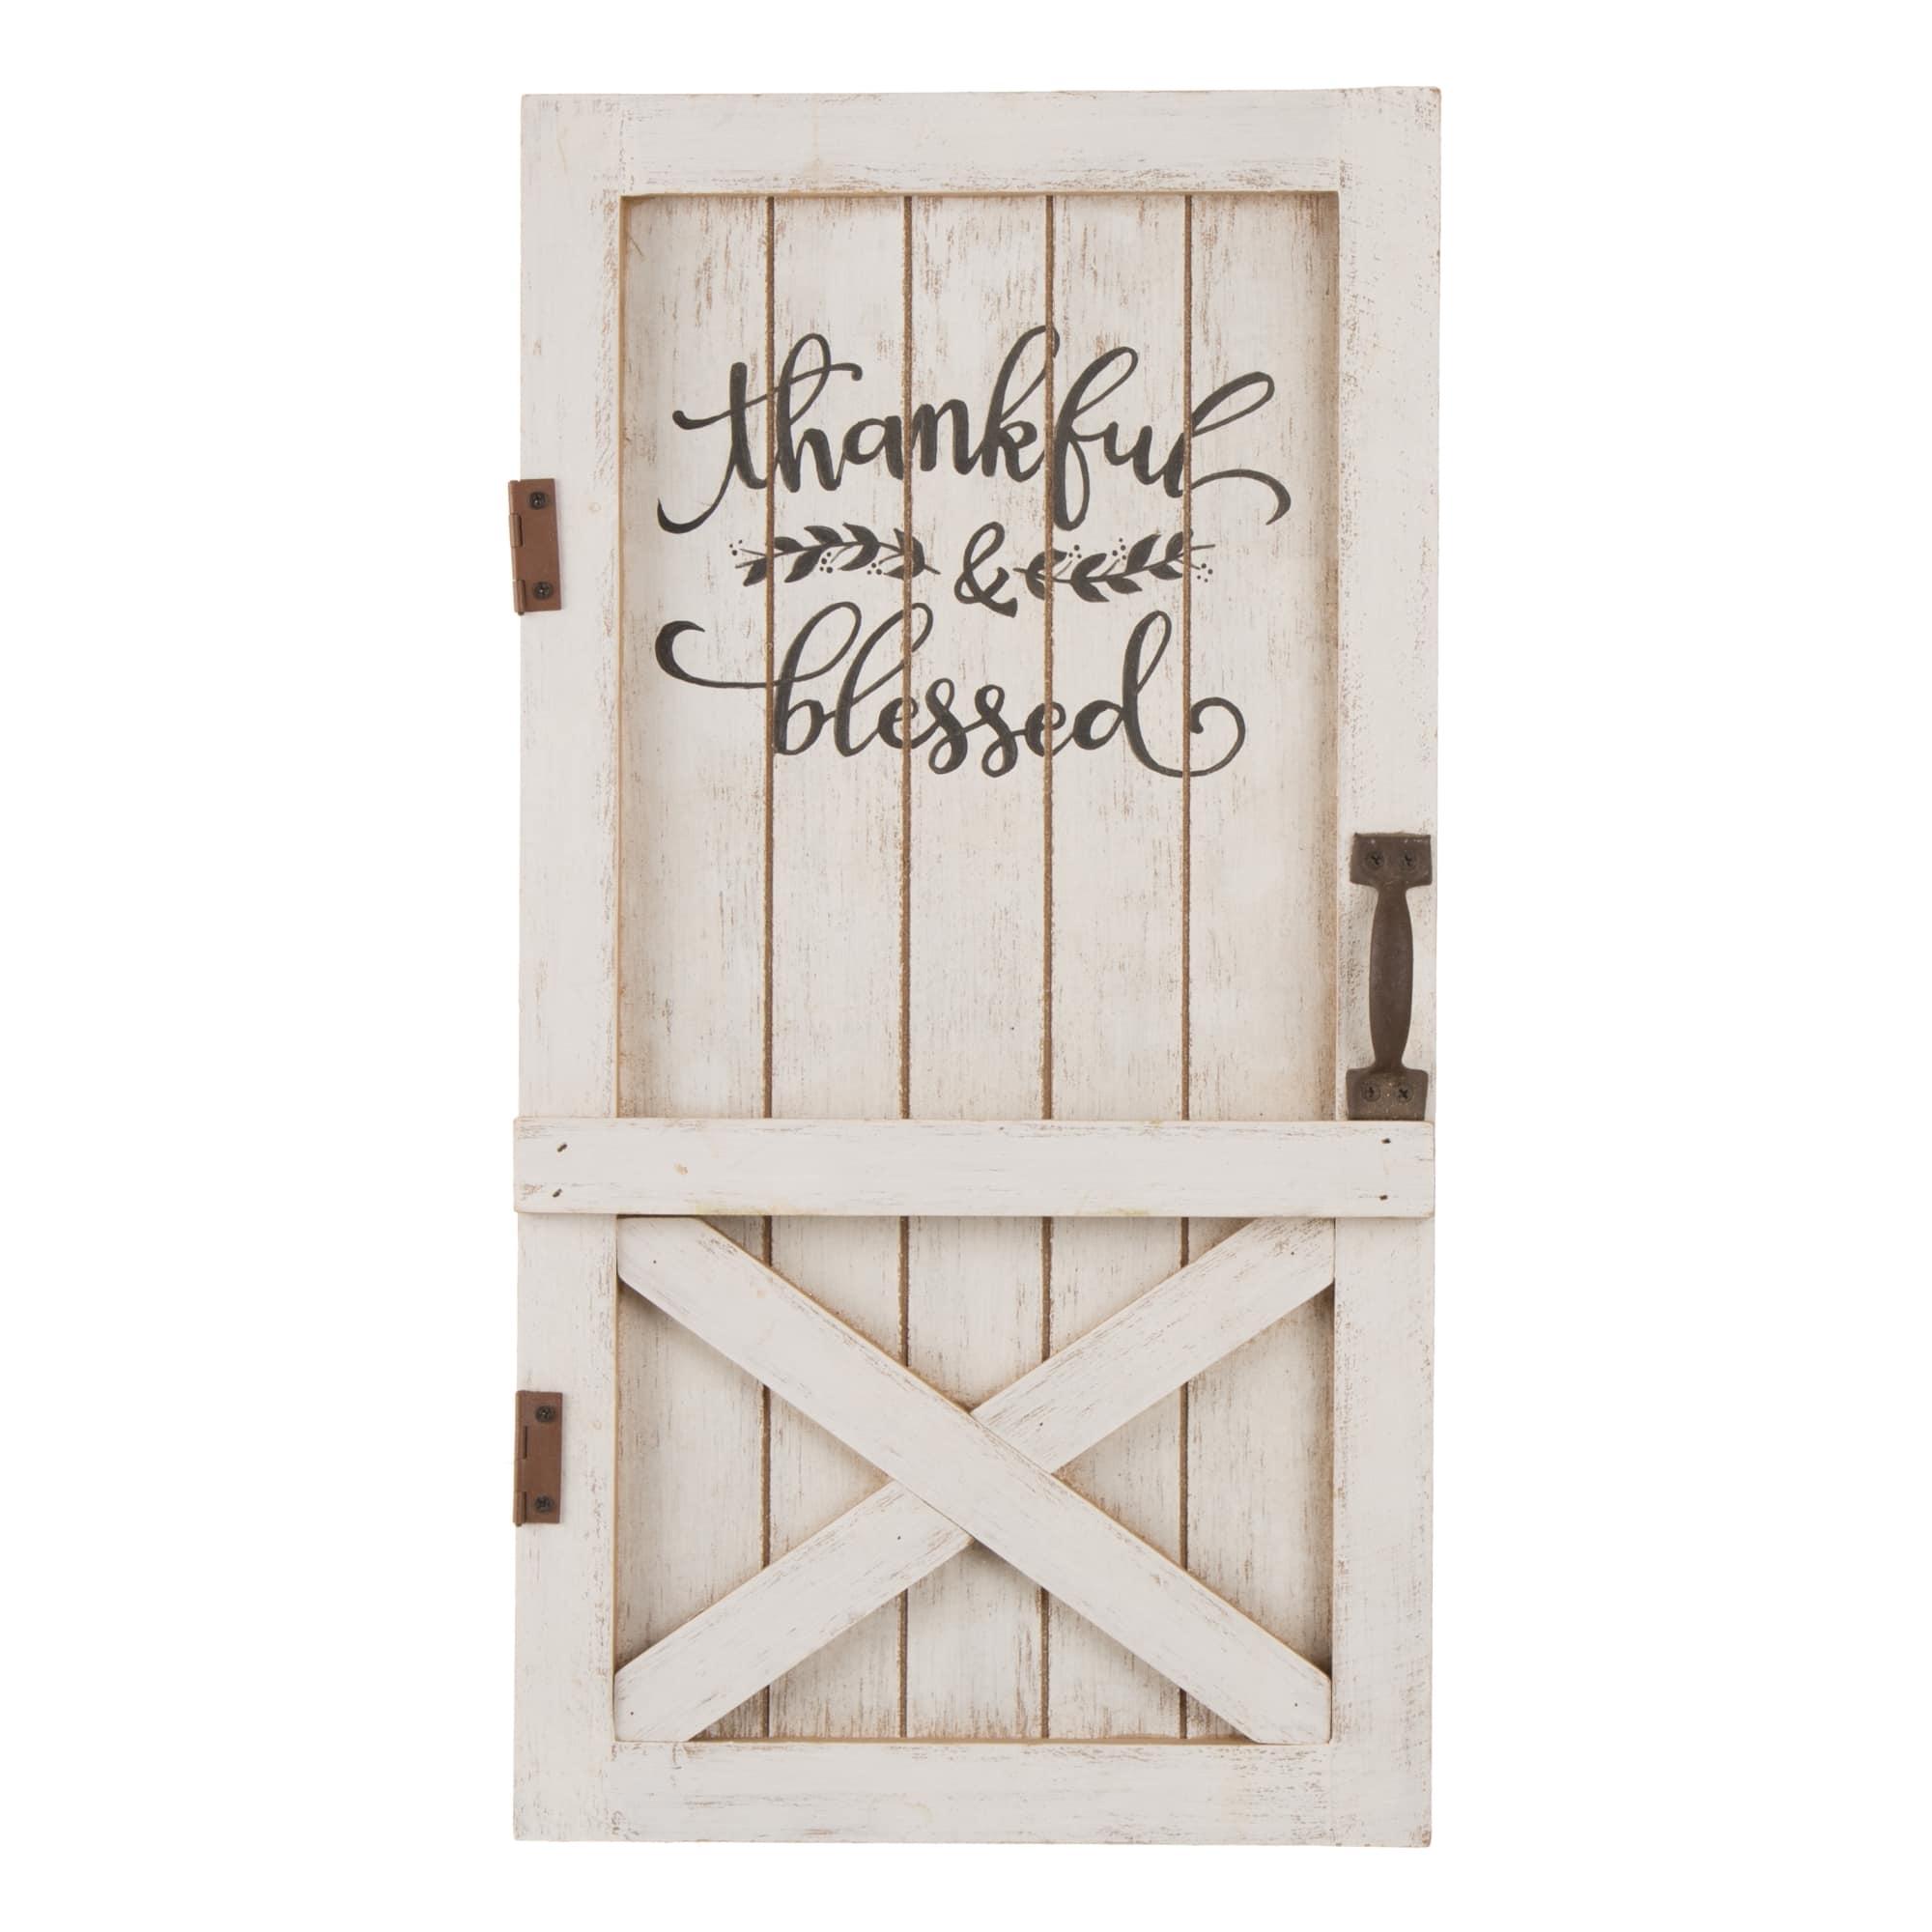 Glitzhome® White Wooden Thanksgiving Barn Door Décor by Glitzhome